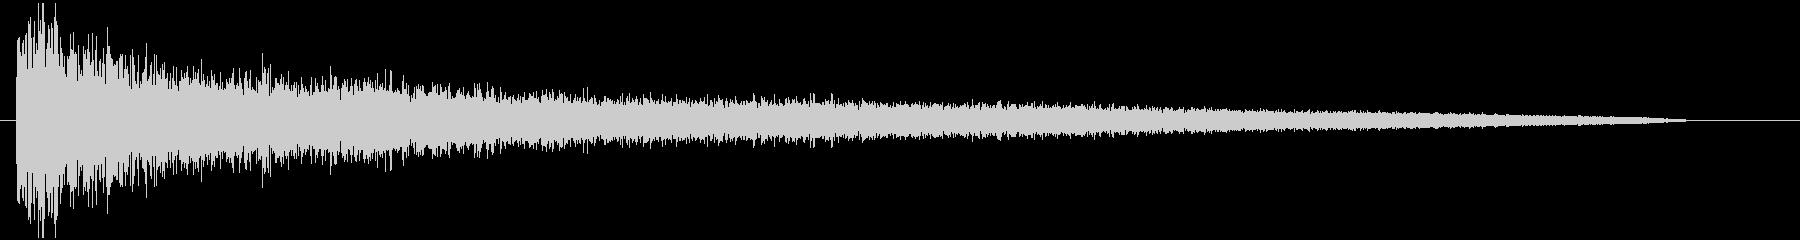 FX ゴングロング01の未再生の波形